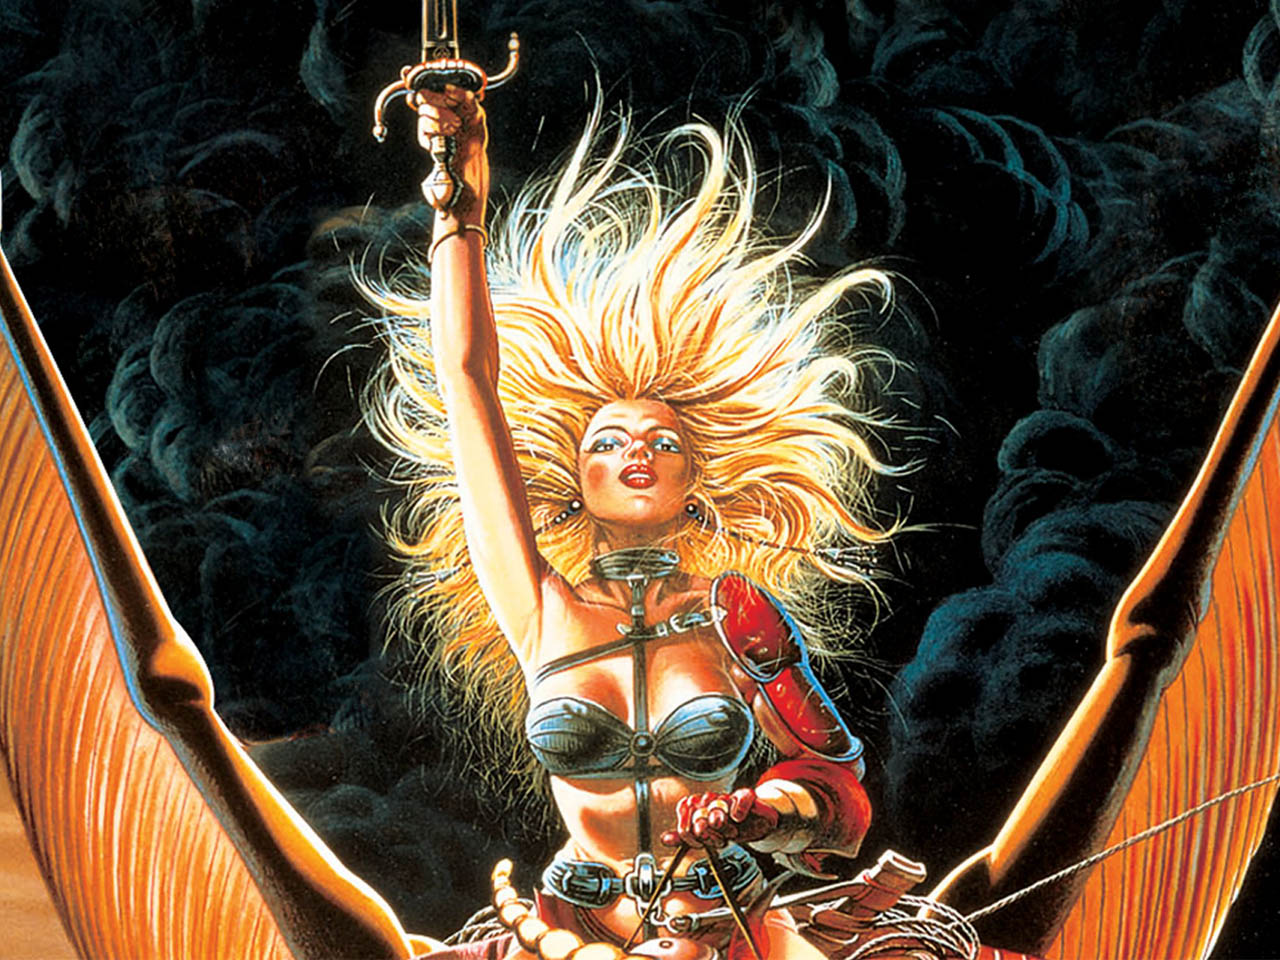 1981 Movie Project - Heavy Metal - 01